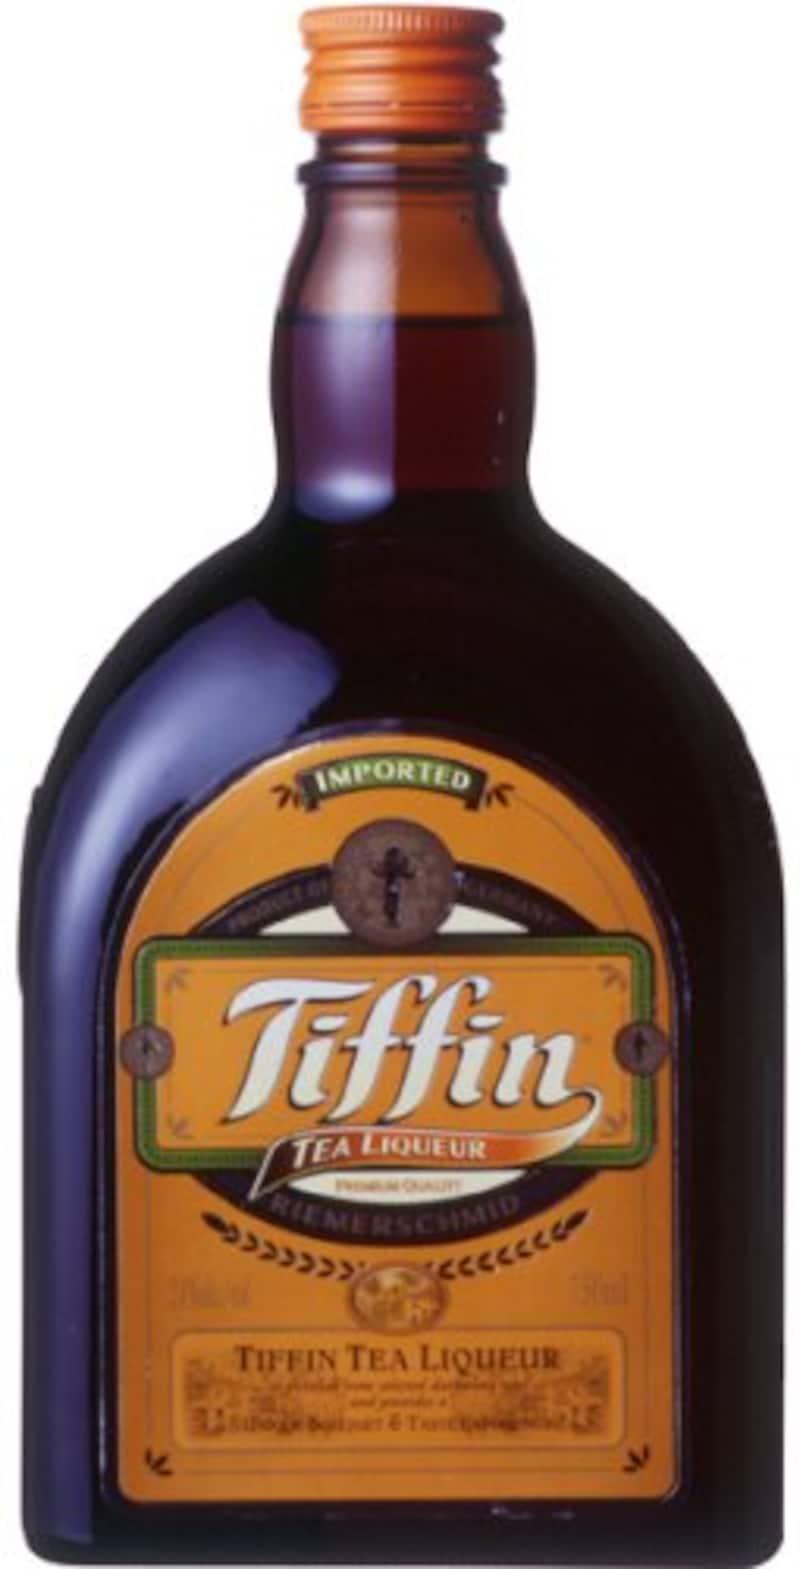 TIFFIN(ティフィン),ティフィン・ティー・リキュール